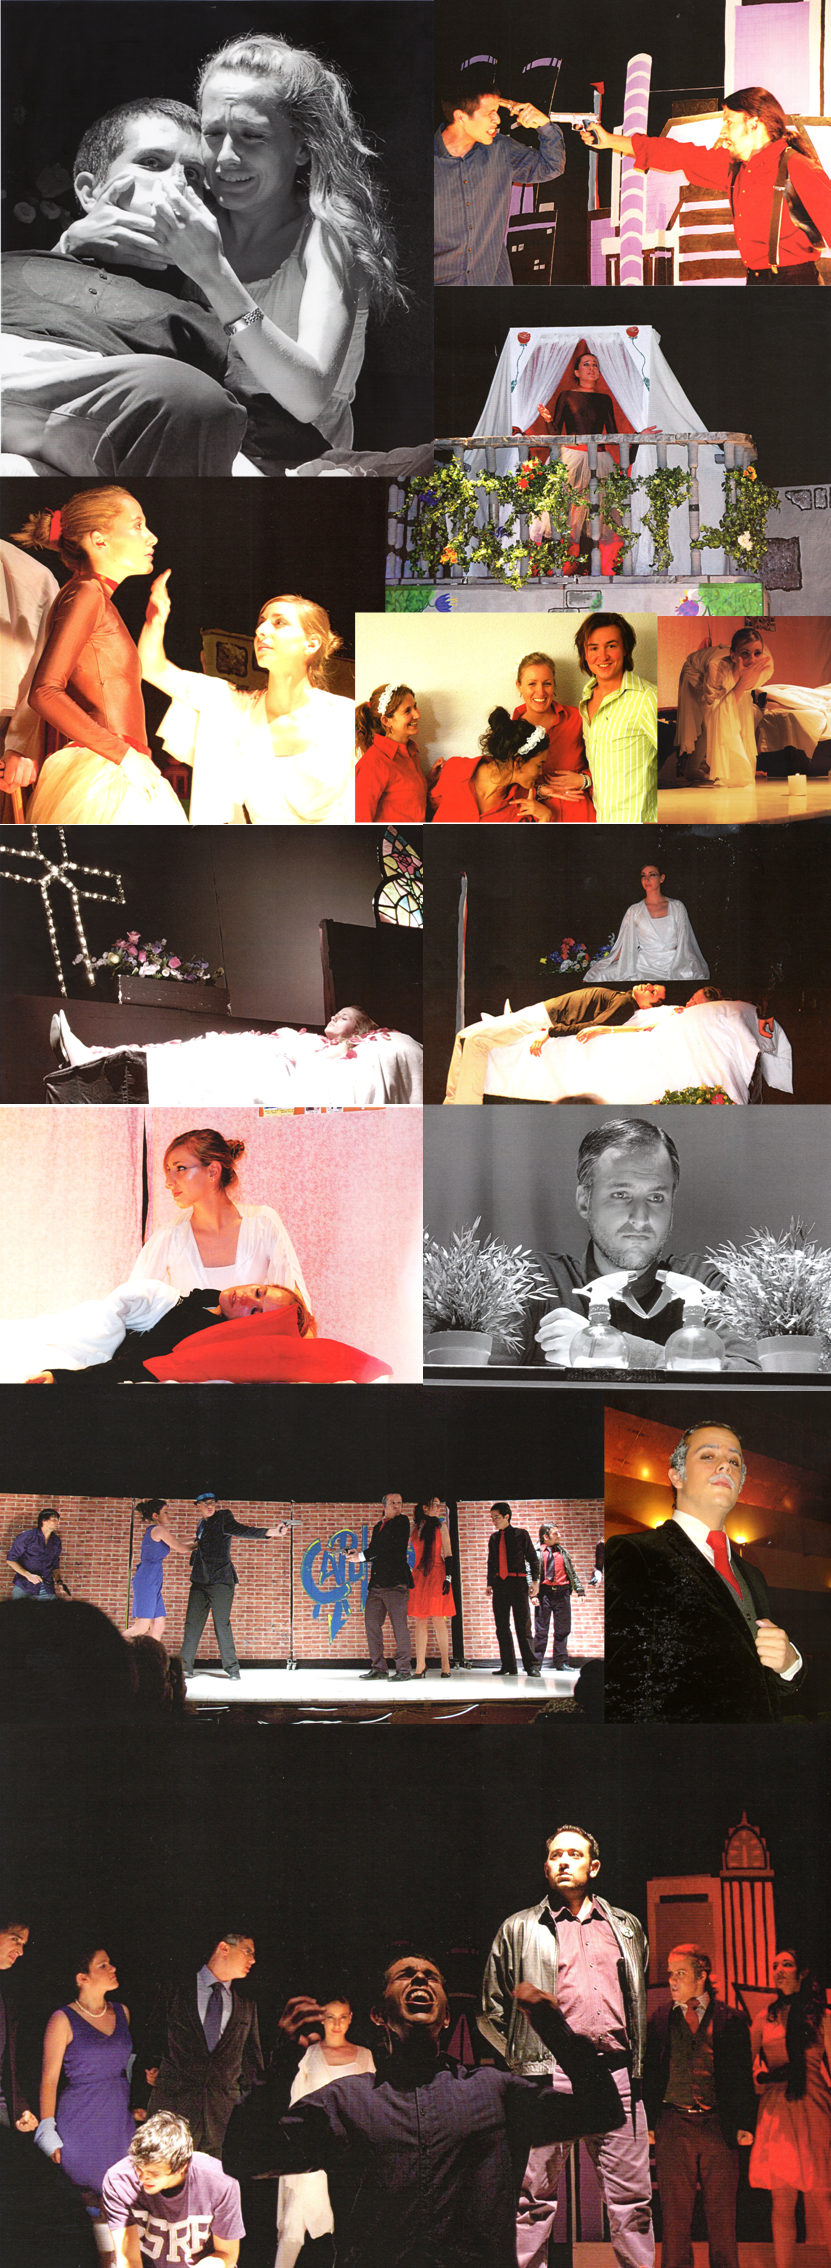 romeo-y-julieta-nodamoscredito-NDC-teatro-foto-obra_002